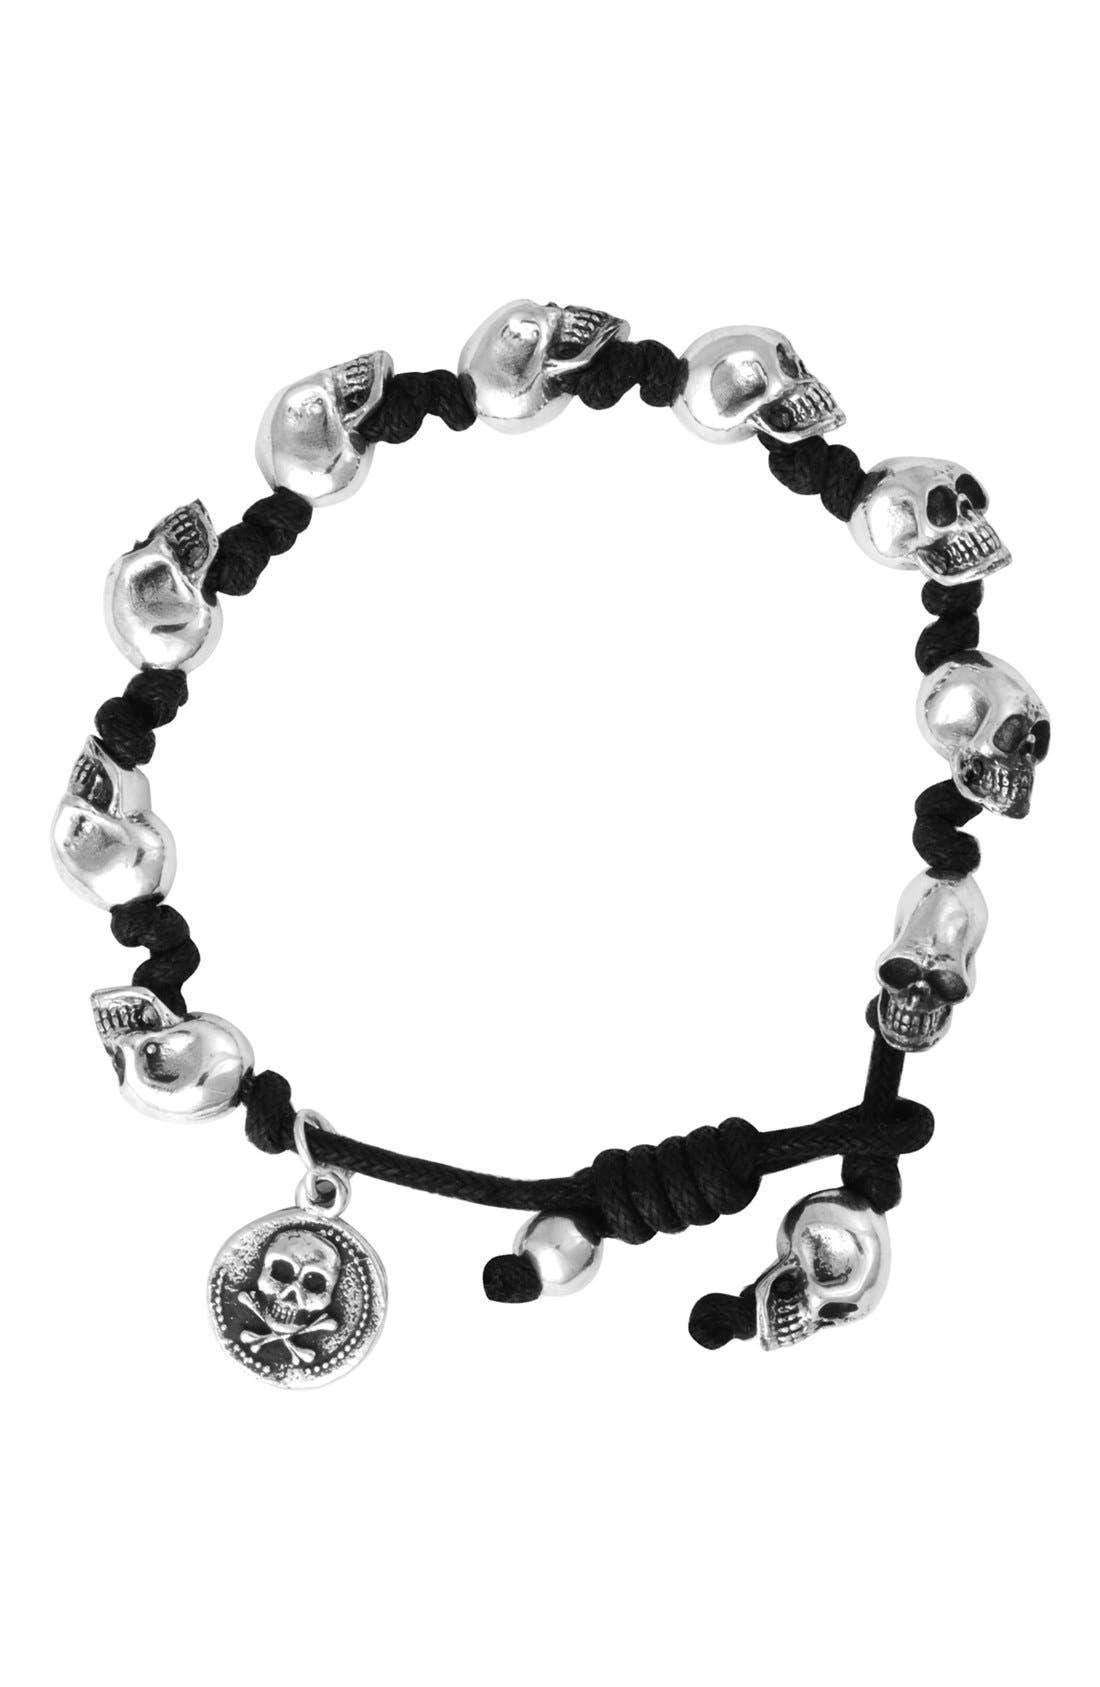 Skull Bead Bracelet,                             Main thumbnail 1, color,                             Silver